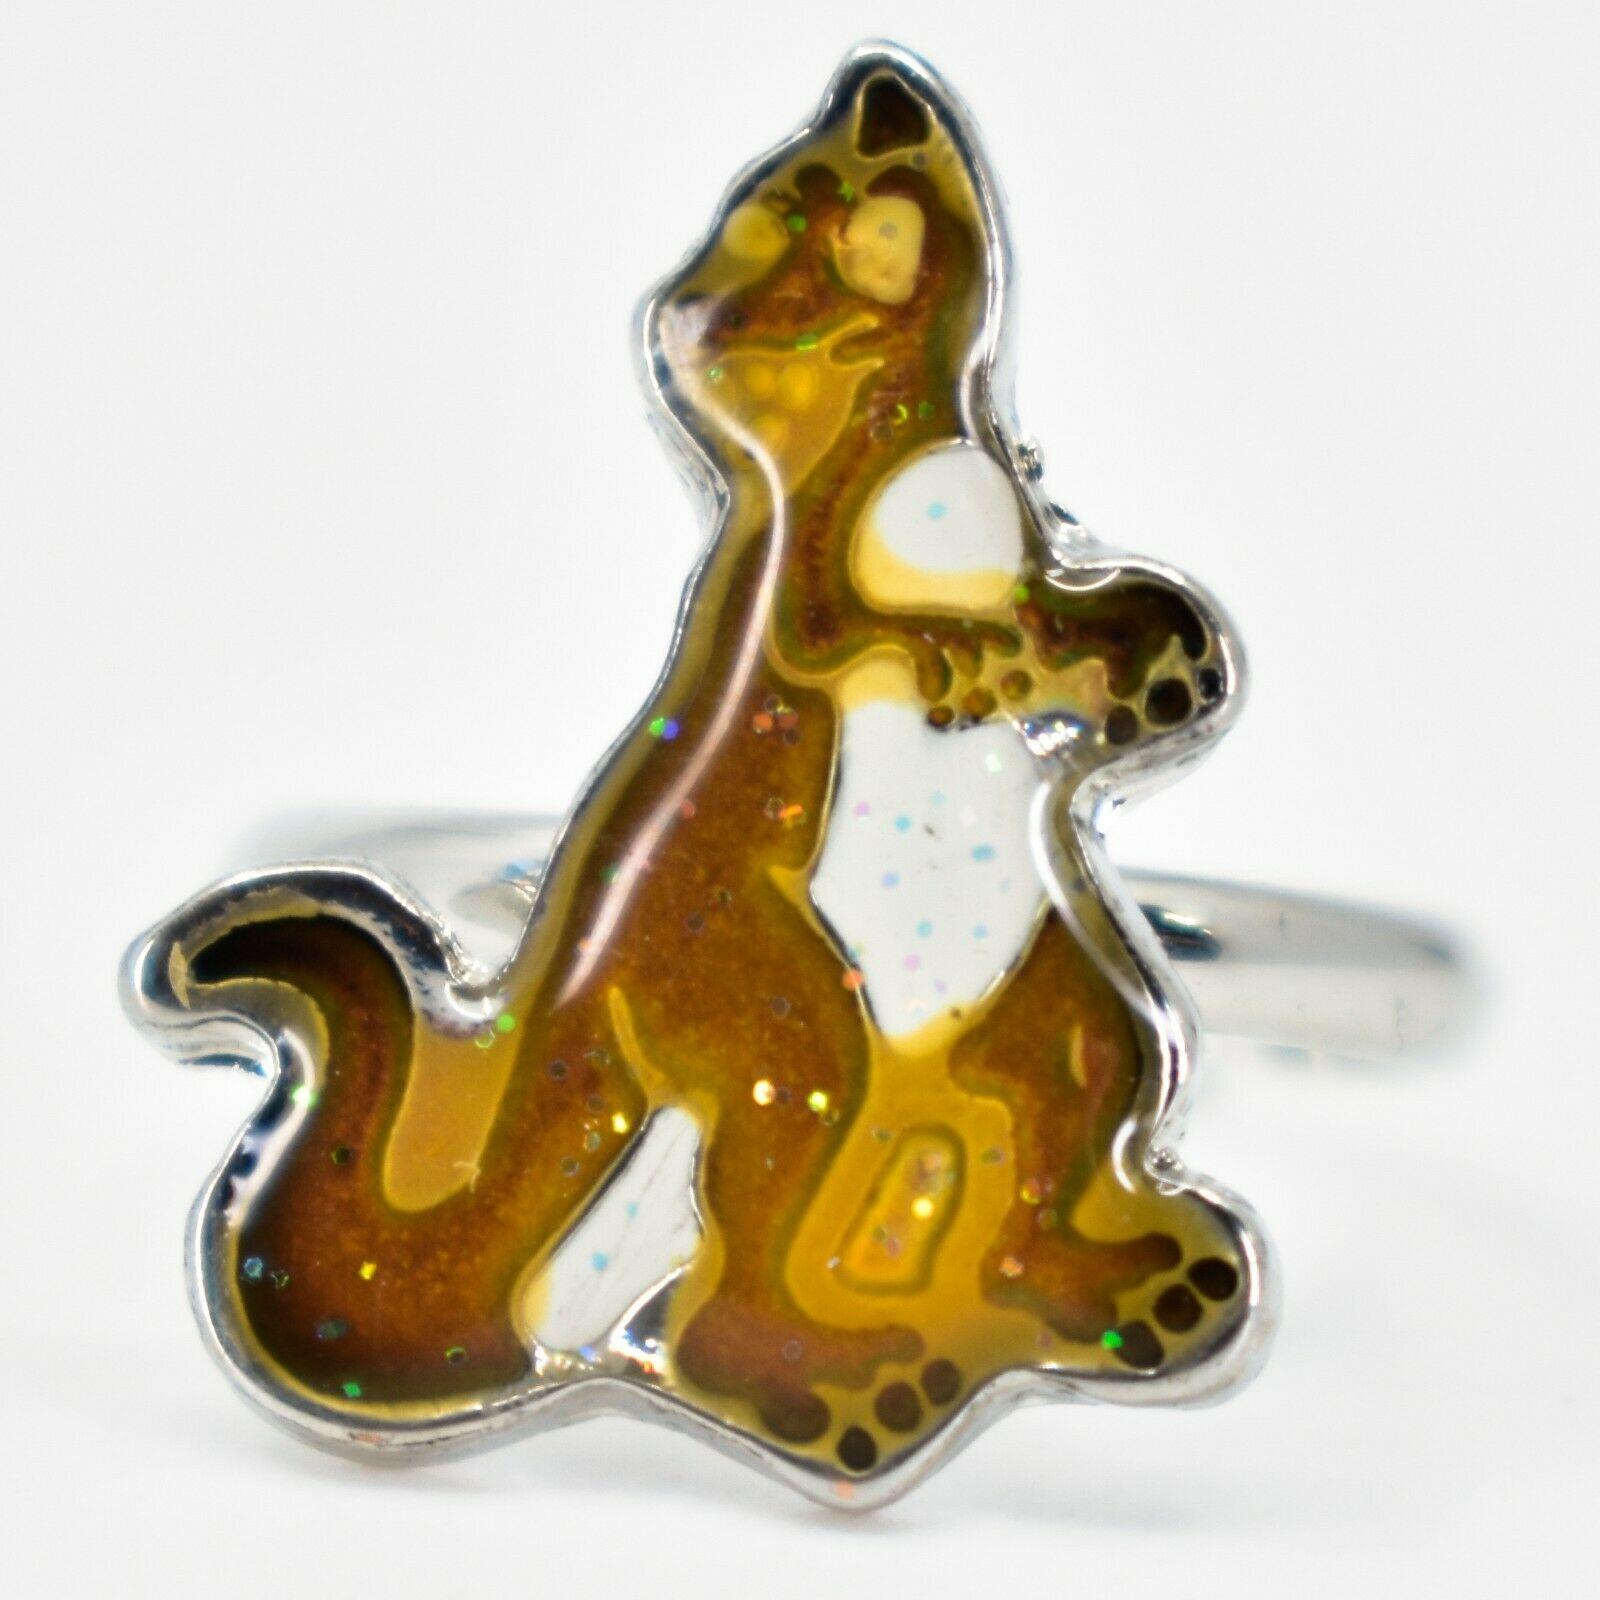 Kid's Fashion Silver Tone Dinosaur Color Changing Fashion Adjustable Mood Ring